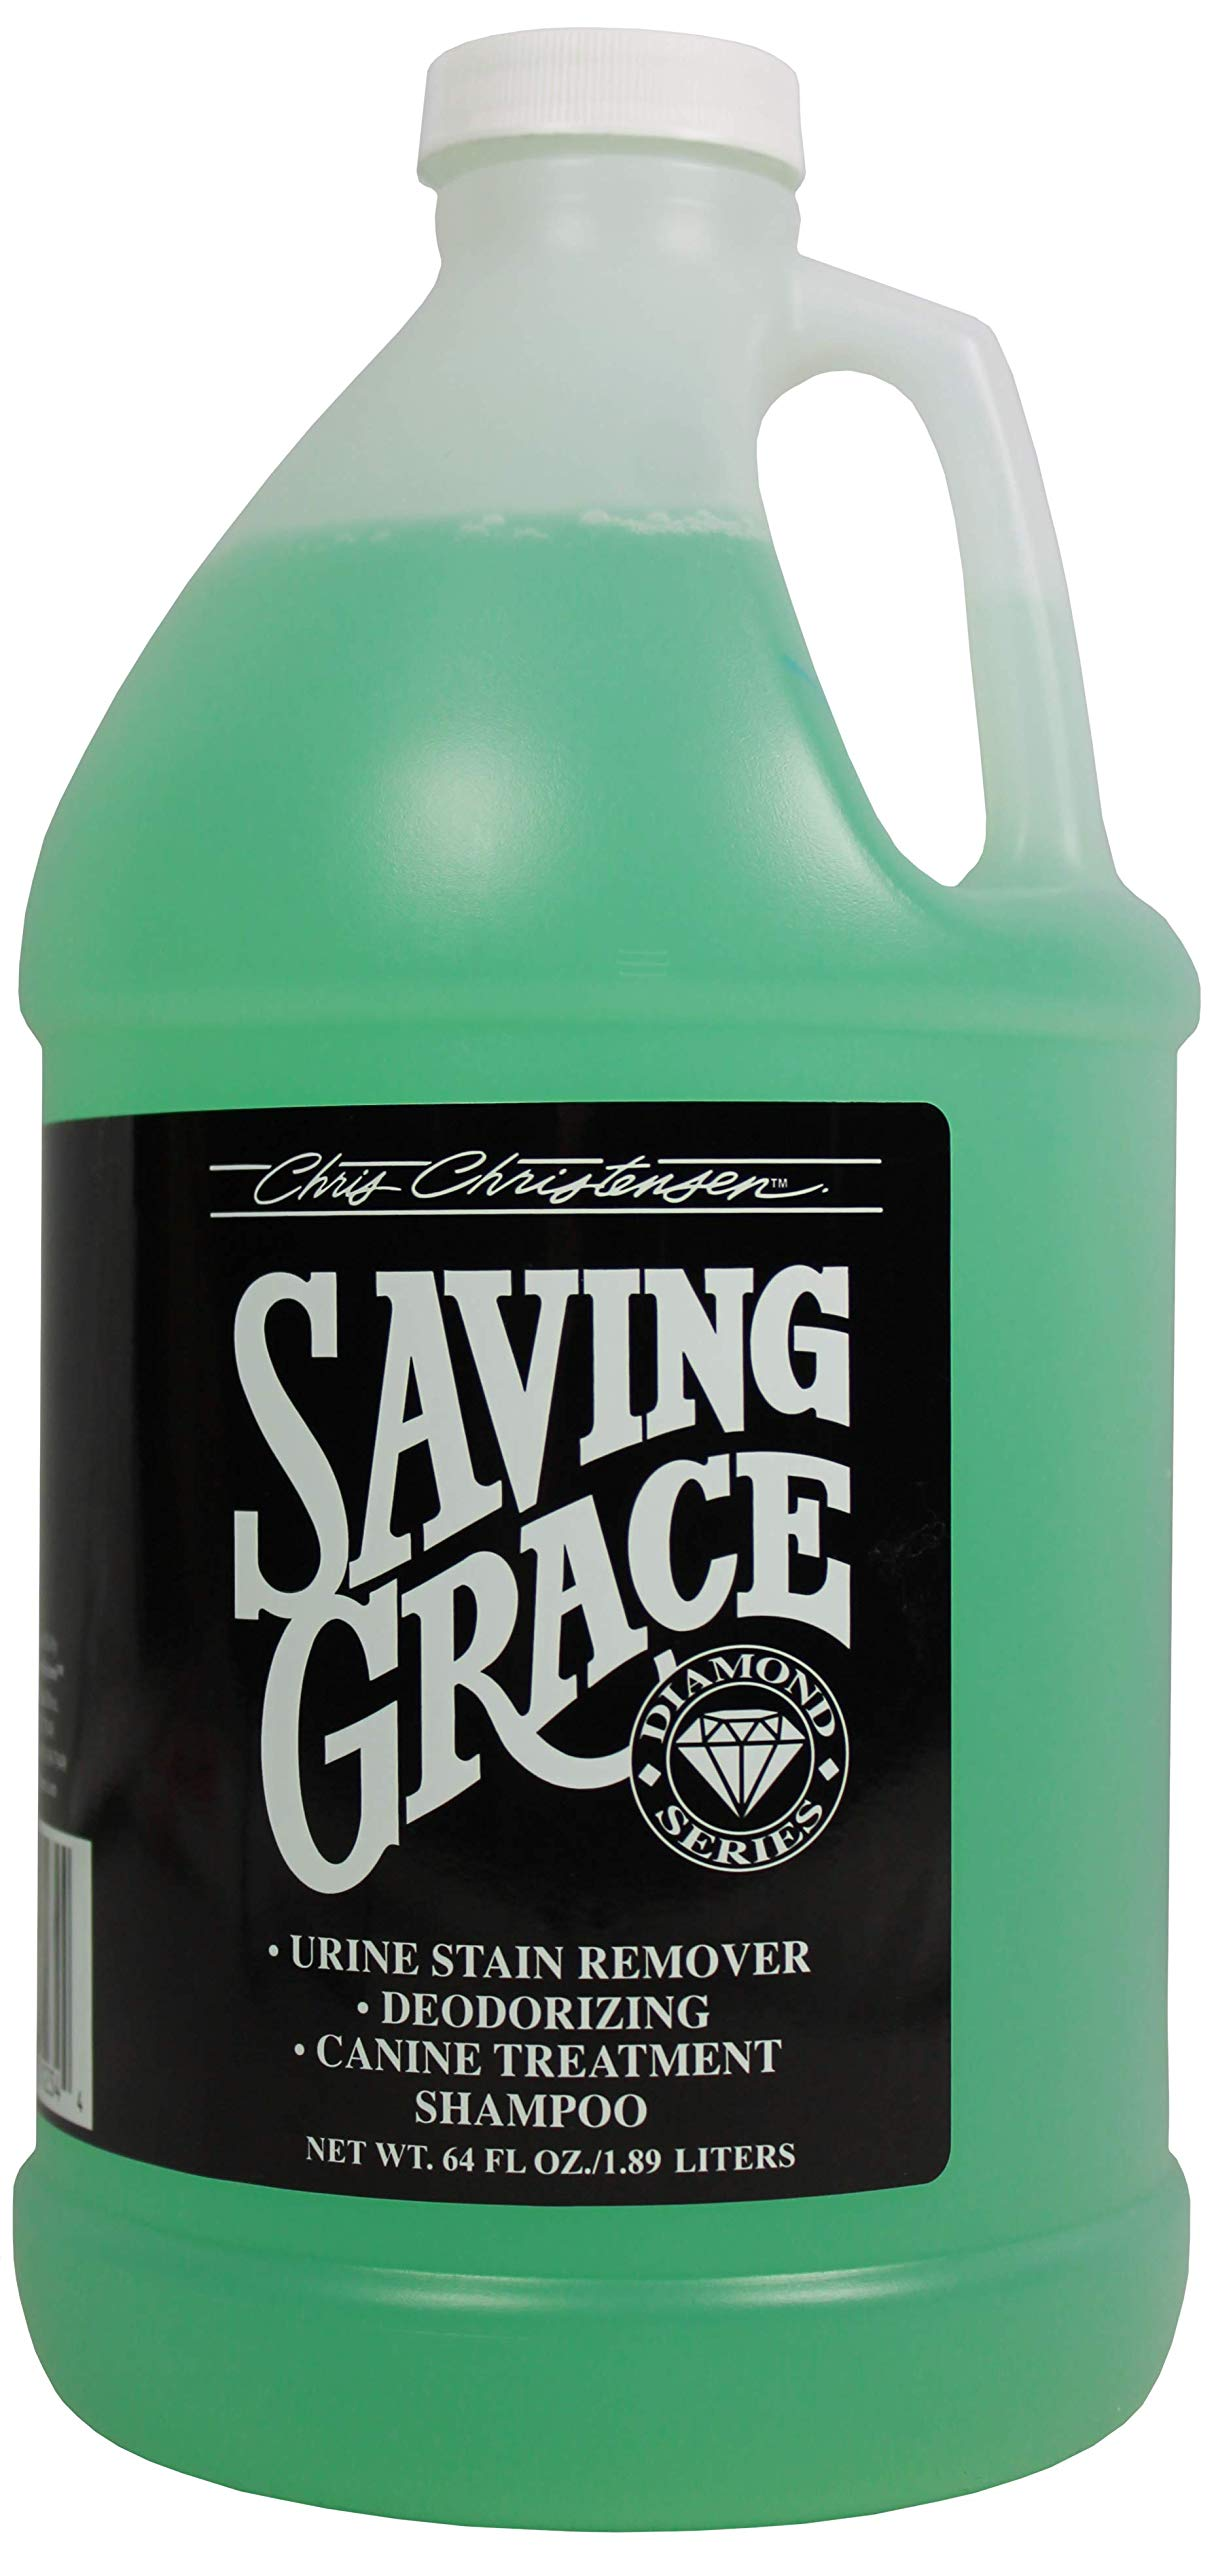 Chris Christensen Saving Grace Stain Removing Treatment (64 oz)